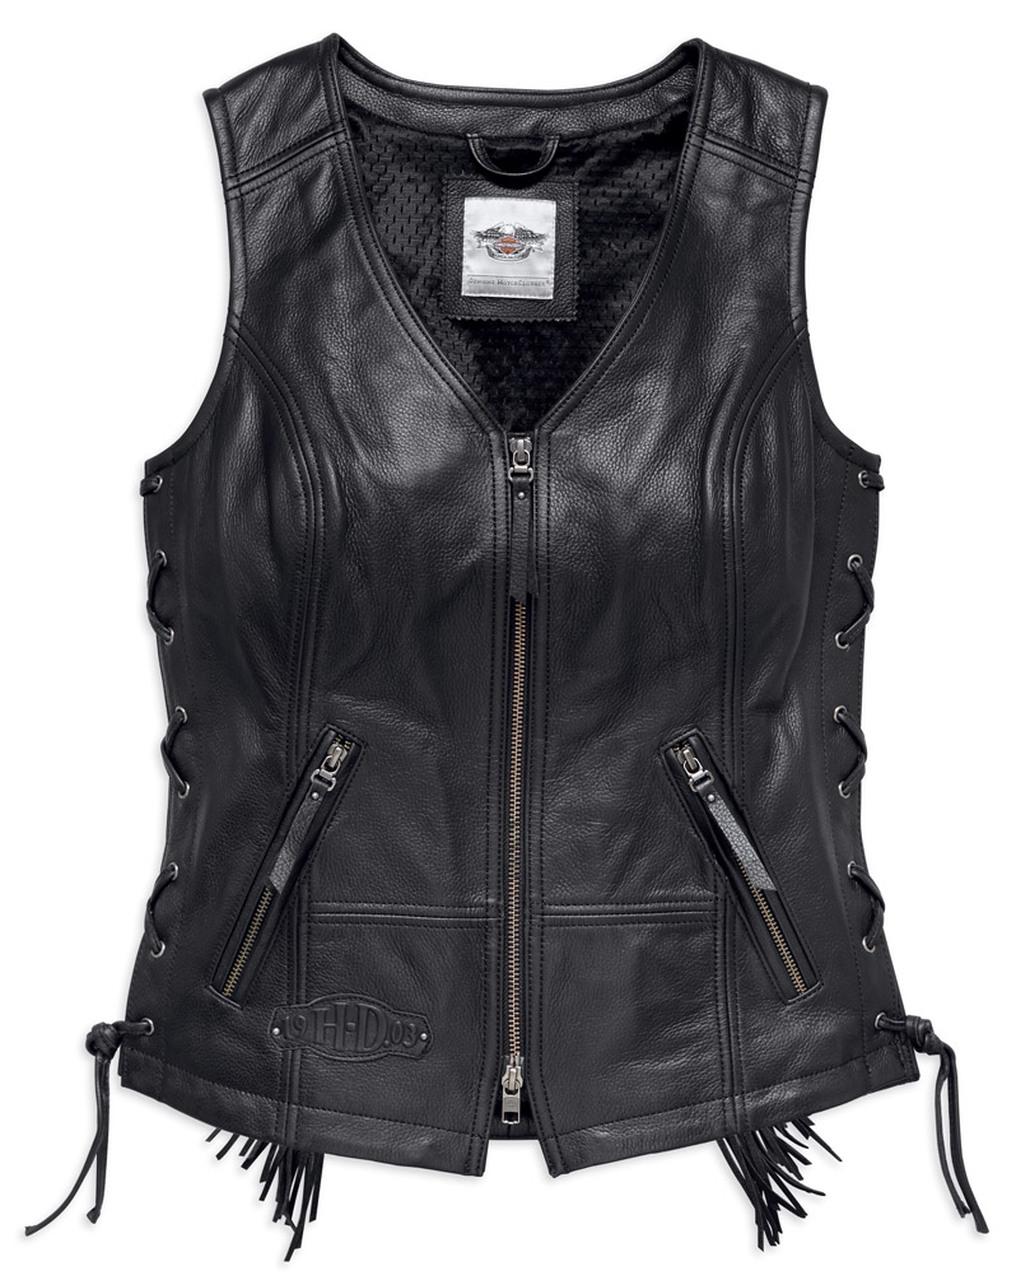 Harley-Davidson® Women's Boone Fringed Side Lace Leather Vest, Black